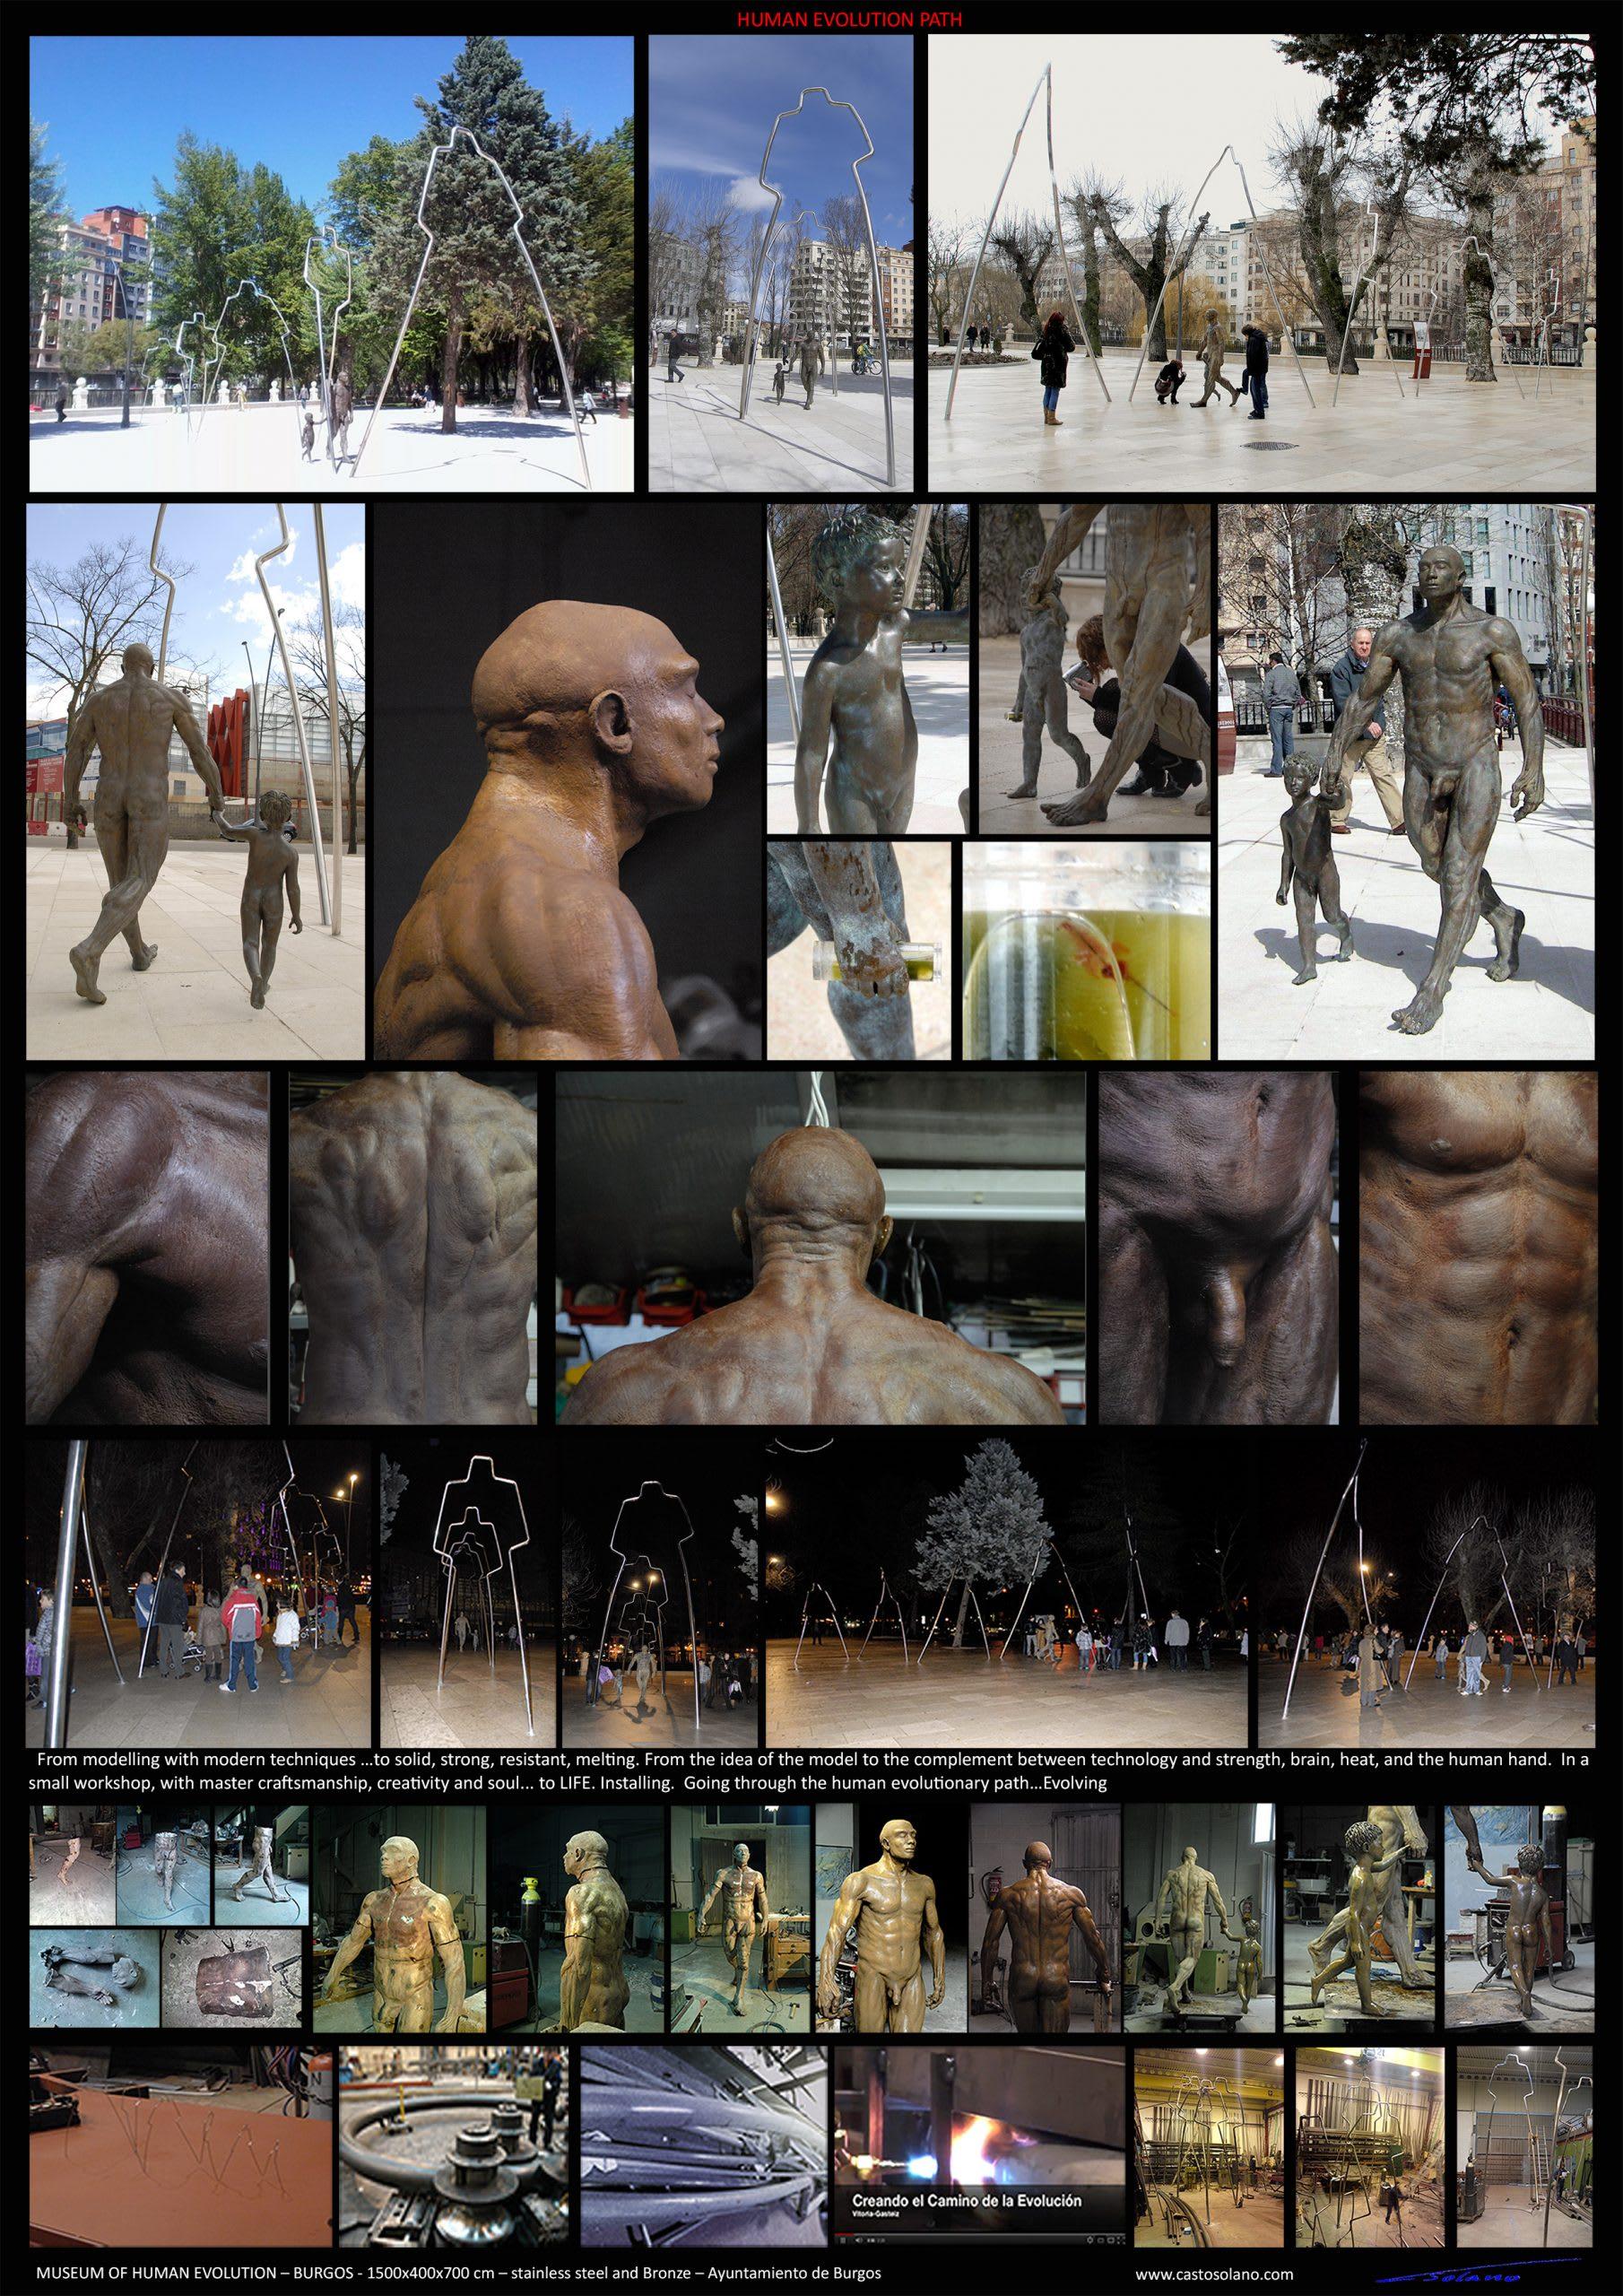 Path of Human Evolution